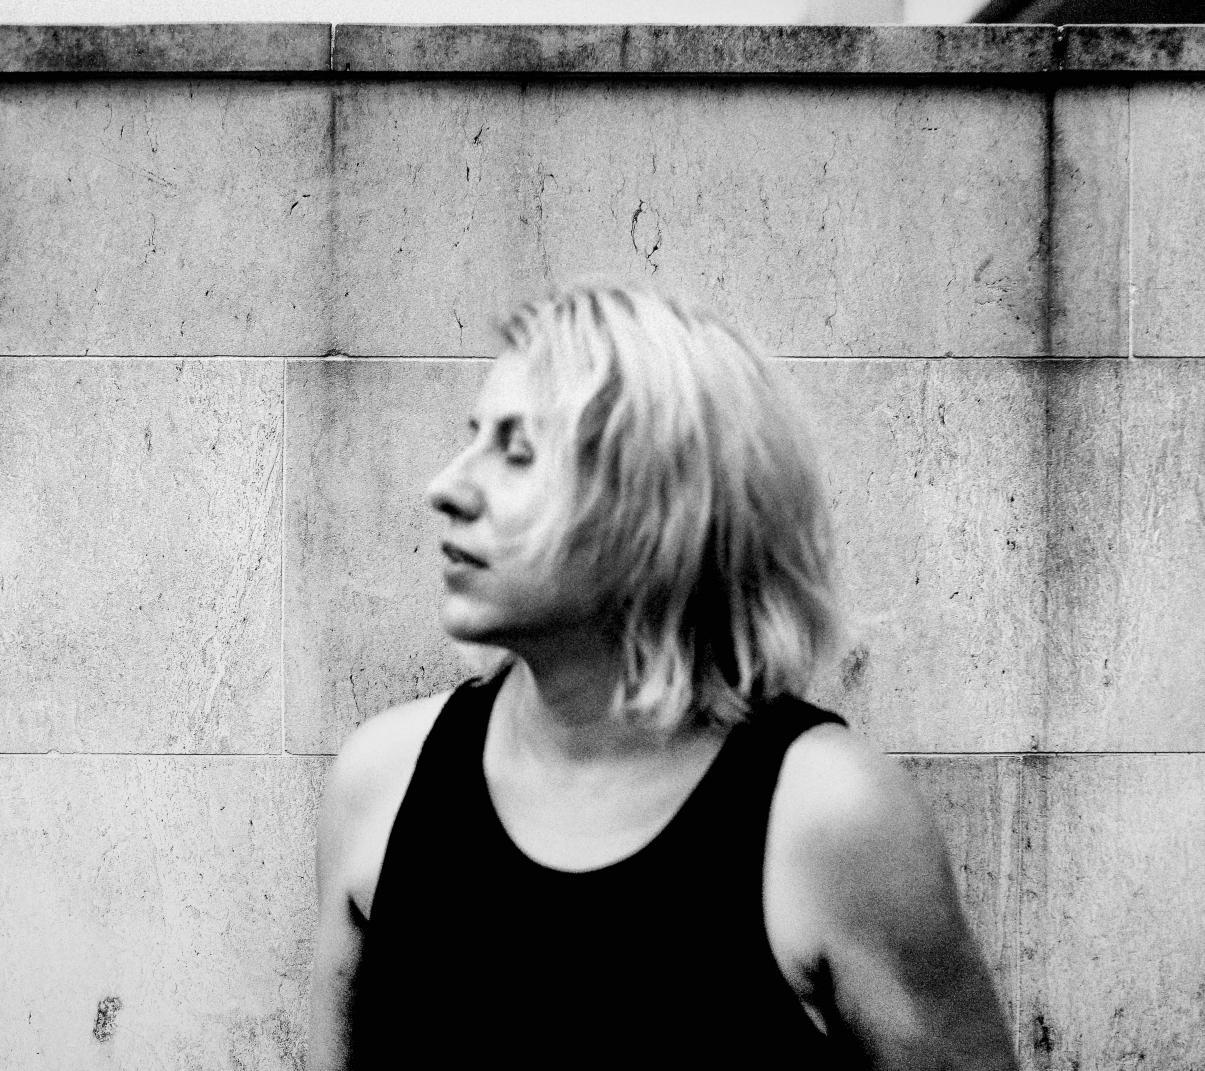 Dorota Barová (foto Dušan Tománek 2018)